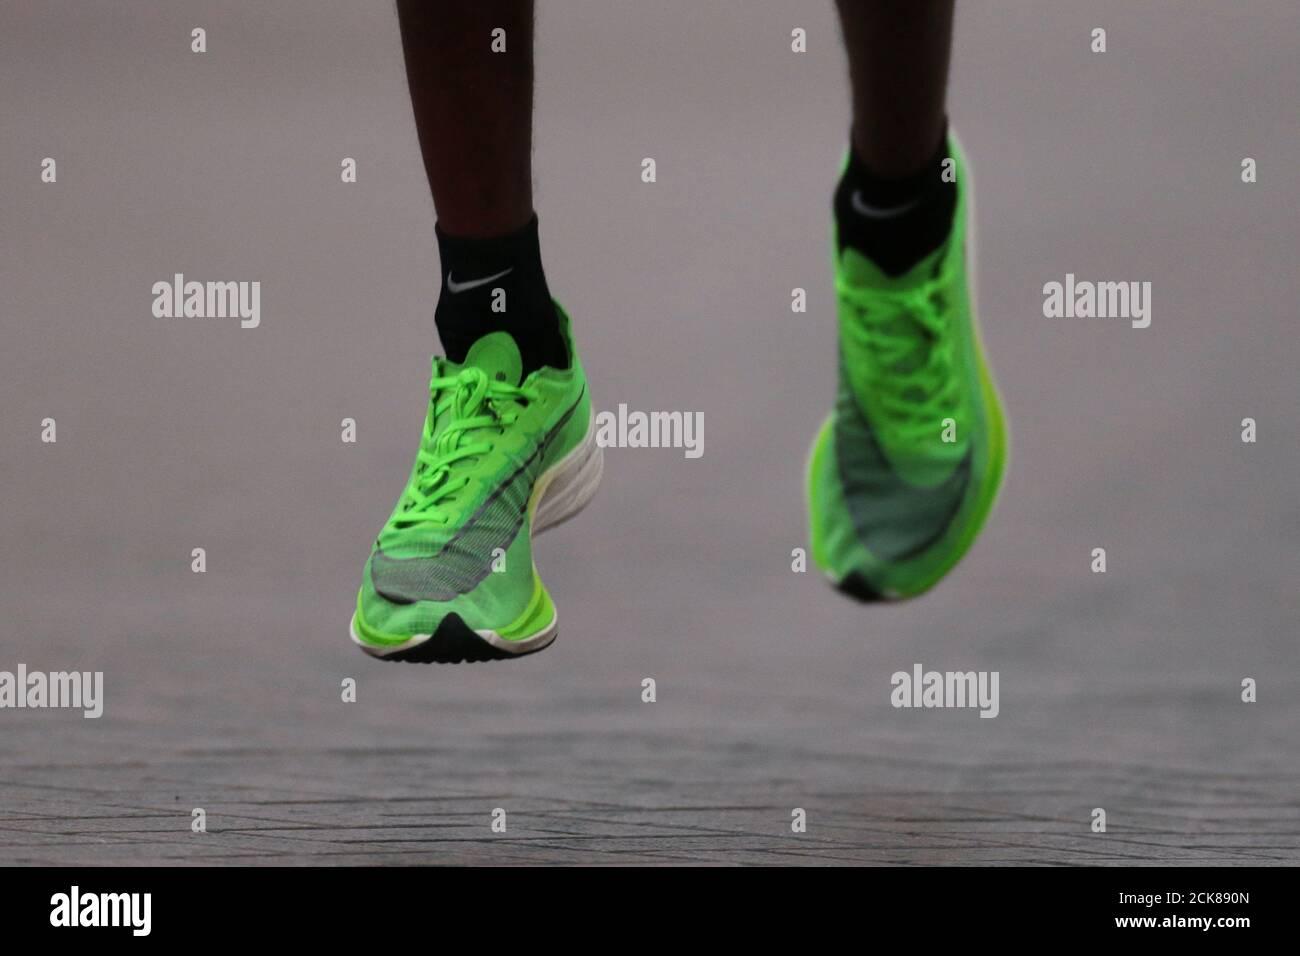 Cuerpo espada Escribe email  Athletics - Dubai Marathon - Dubai, United Arab Emirates - January 24, 2020  General view of athletes wearing the Nike Vaporfly shoe during the race  REUTERS/Christopher Pike Stock Photo - Alamy